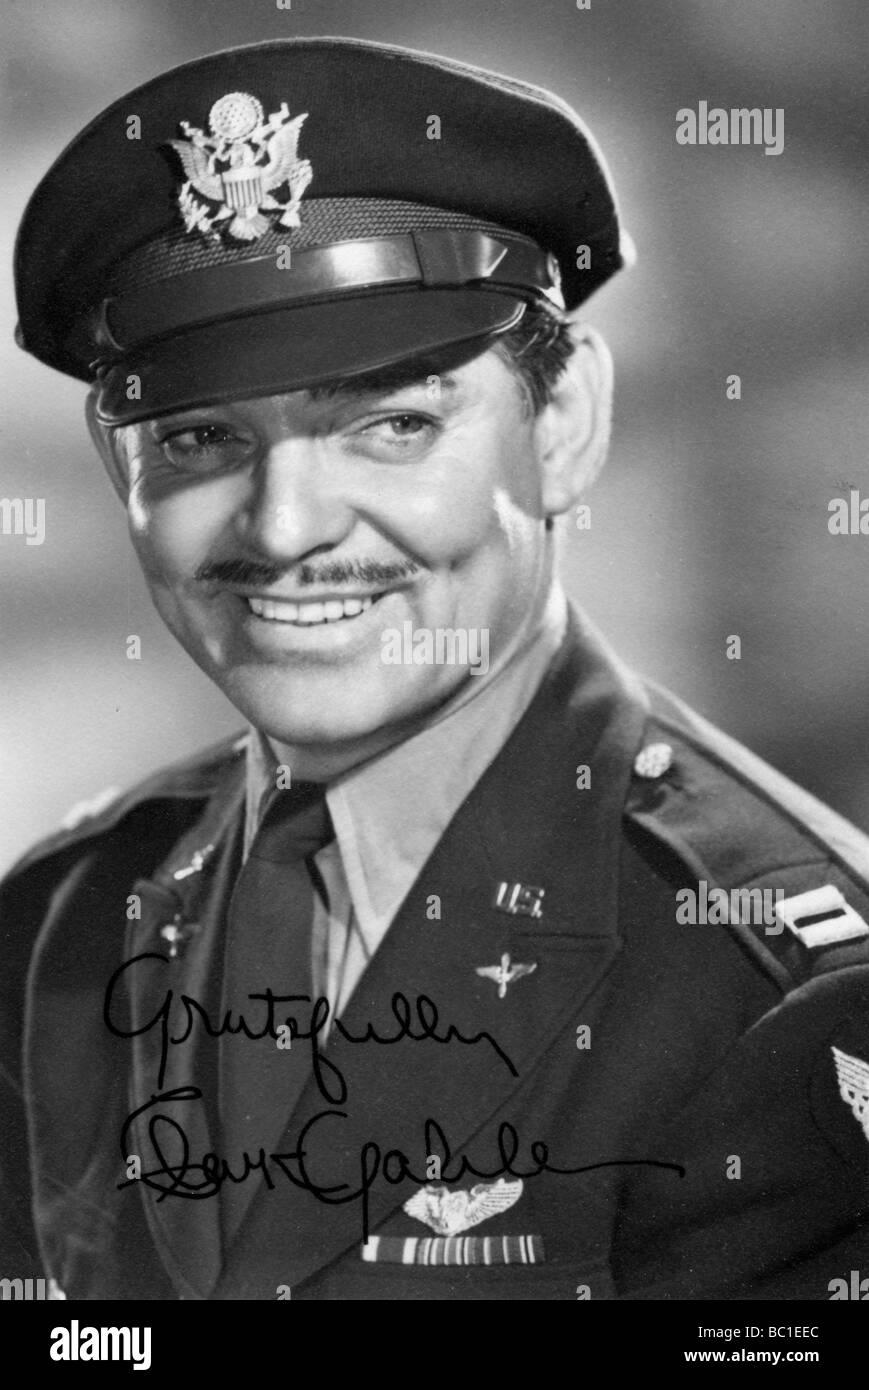 Clark Gable, American actor, c1942-1945. - Stock Image